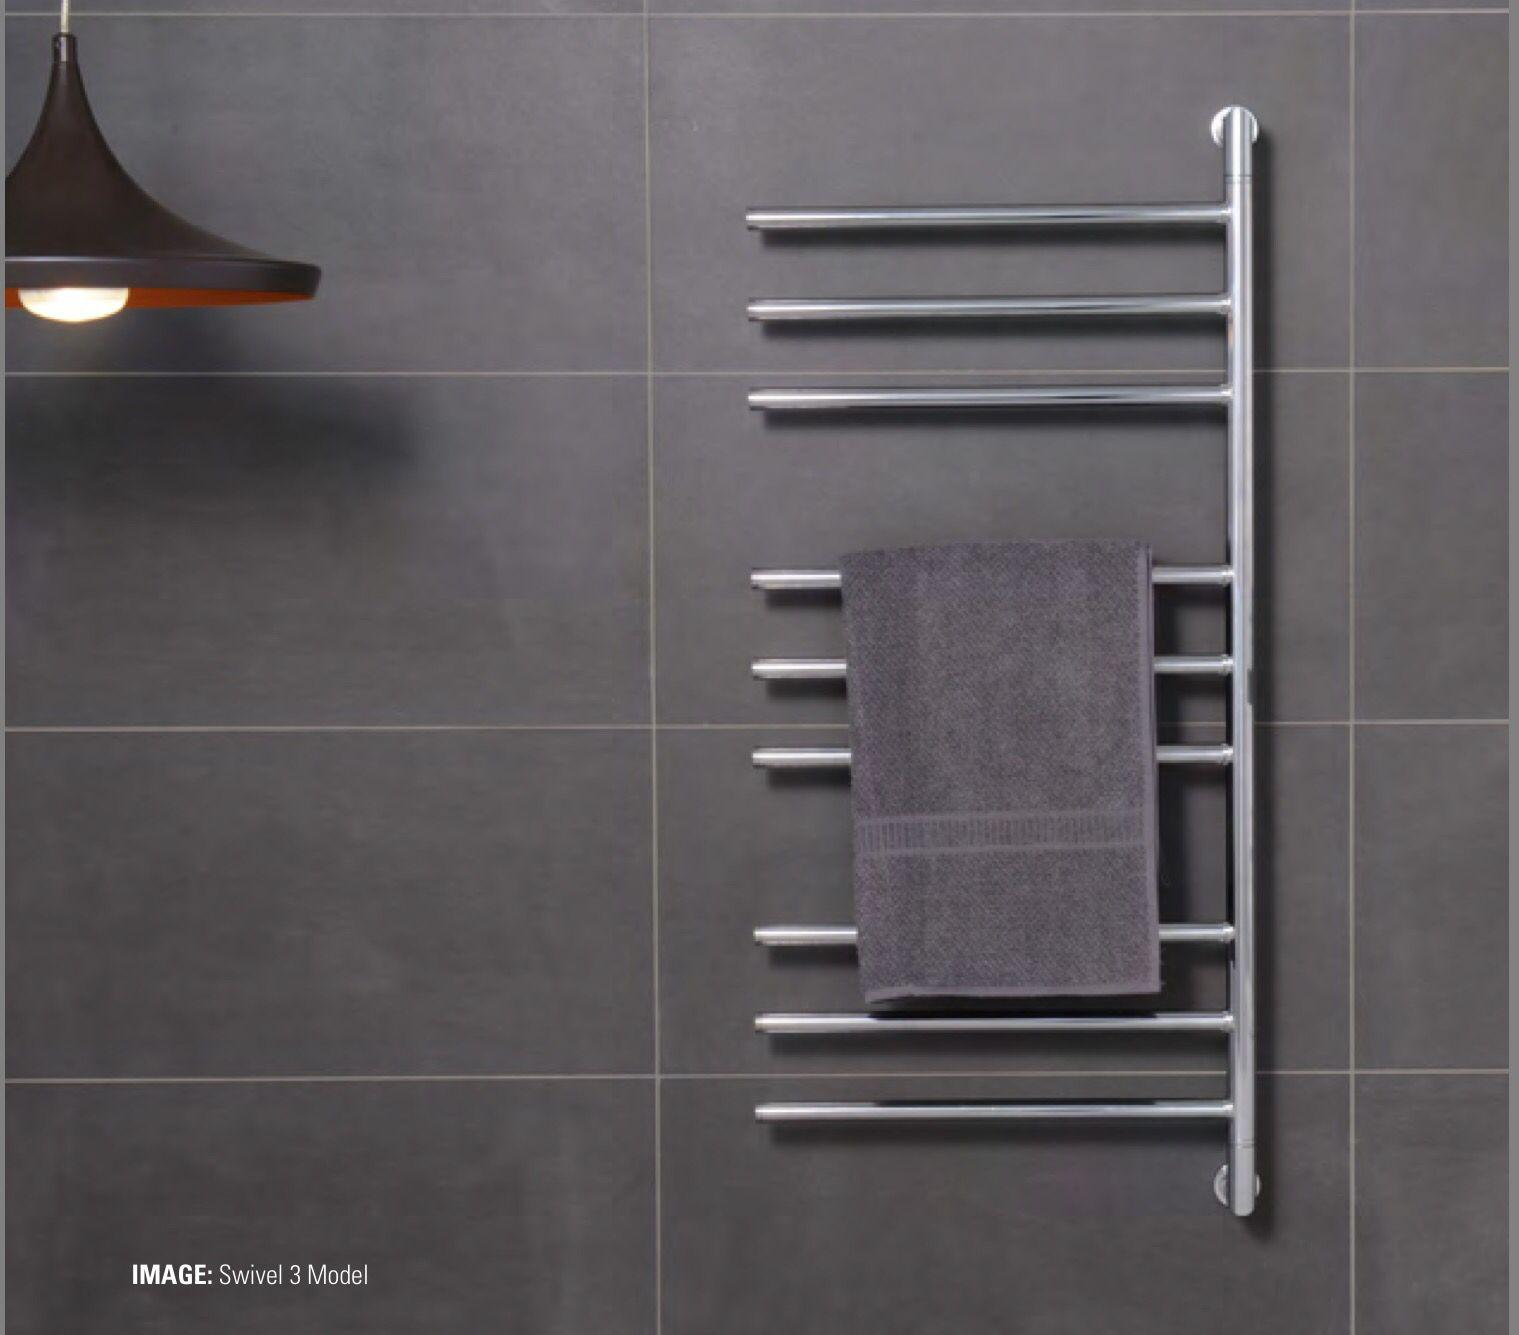 Hydrotherm Swivel Heated Towel Rail Heated Towel Rail Heated Towel Towel Warmer